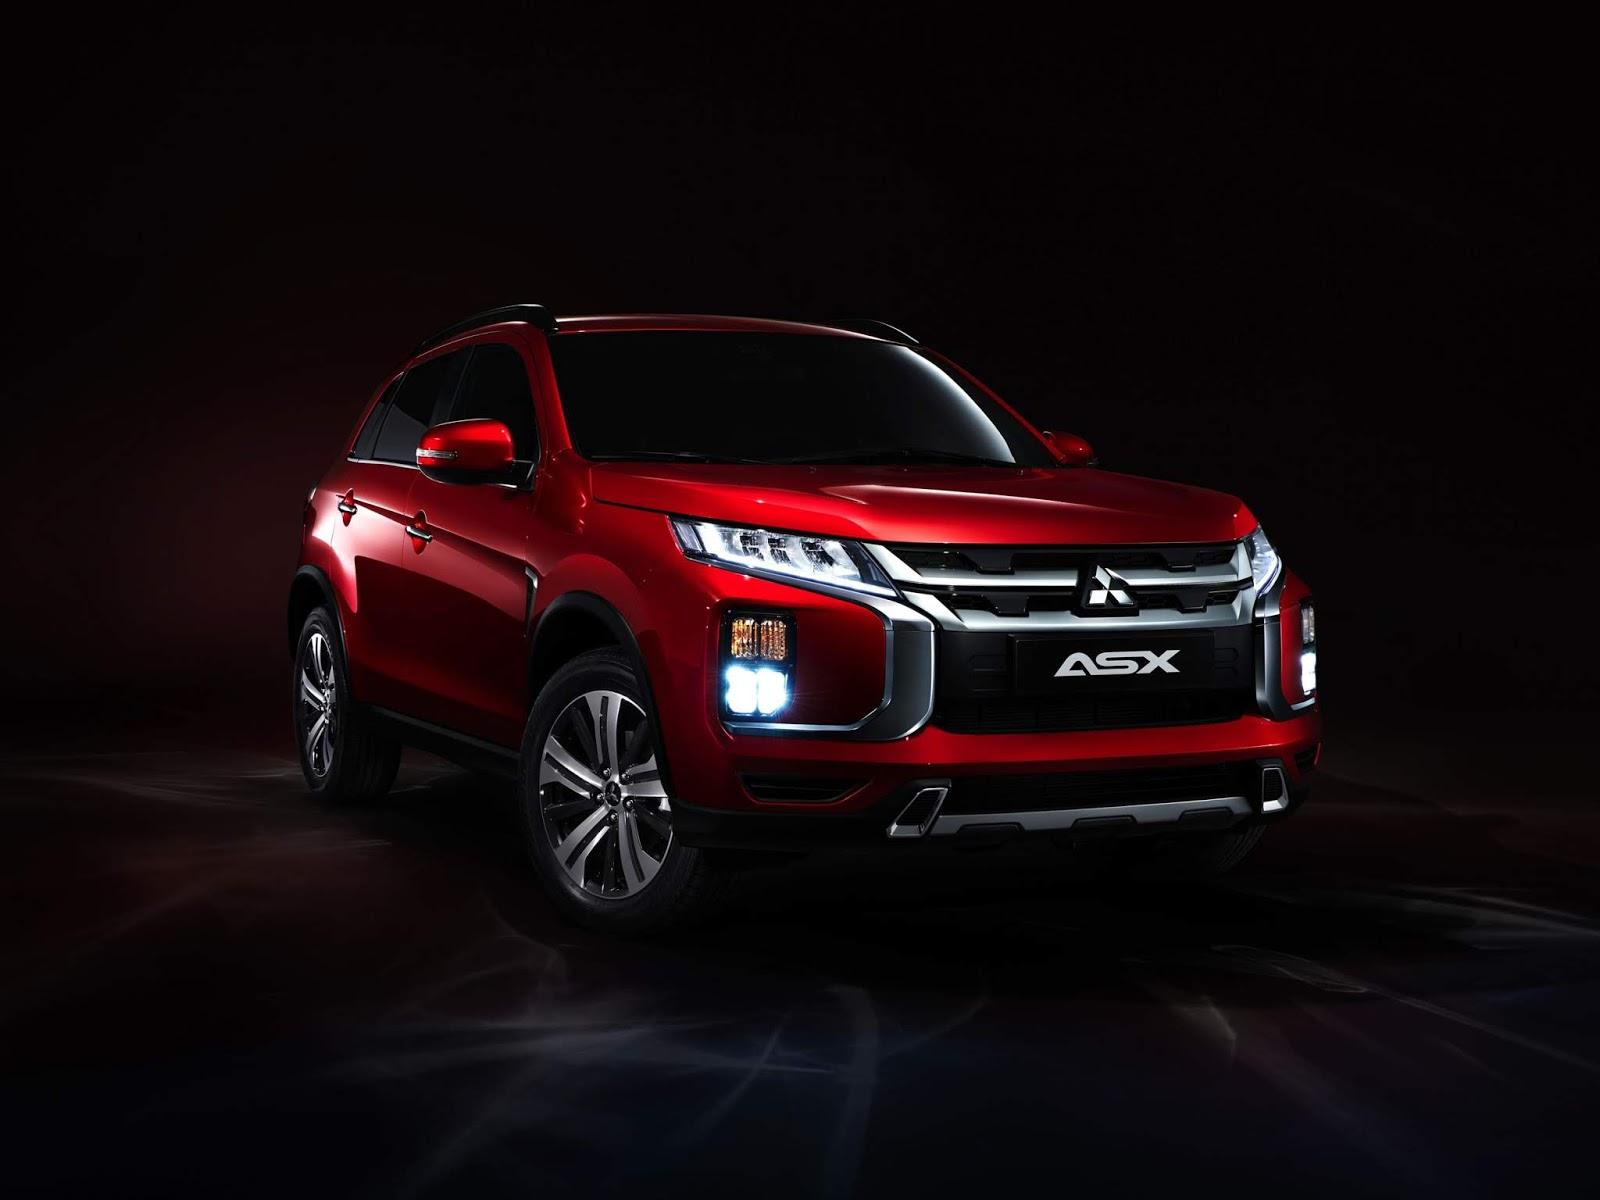 ASX2BMY20 022B252812529 Ιδού το Mitsubishi ASX 2020 Mitsubishi, Mitsubishi ASX, Mitsubishi Motors, Έκθεση Γενεύης